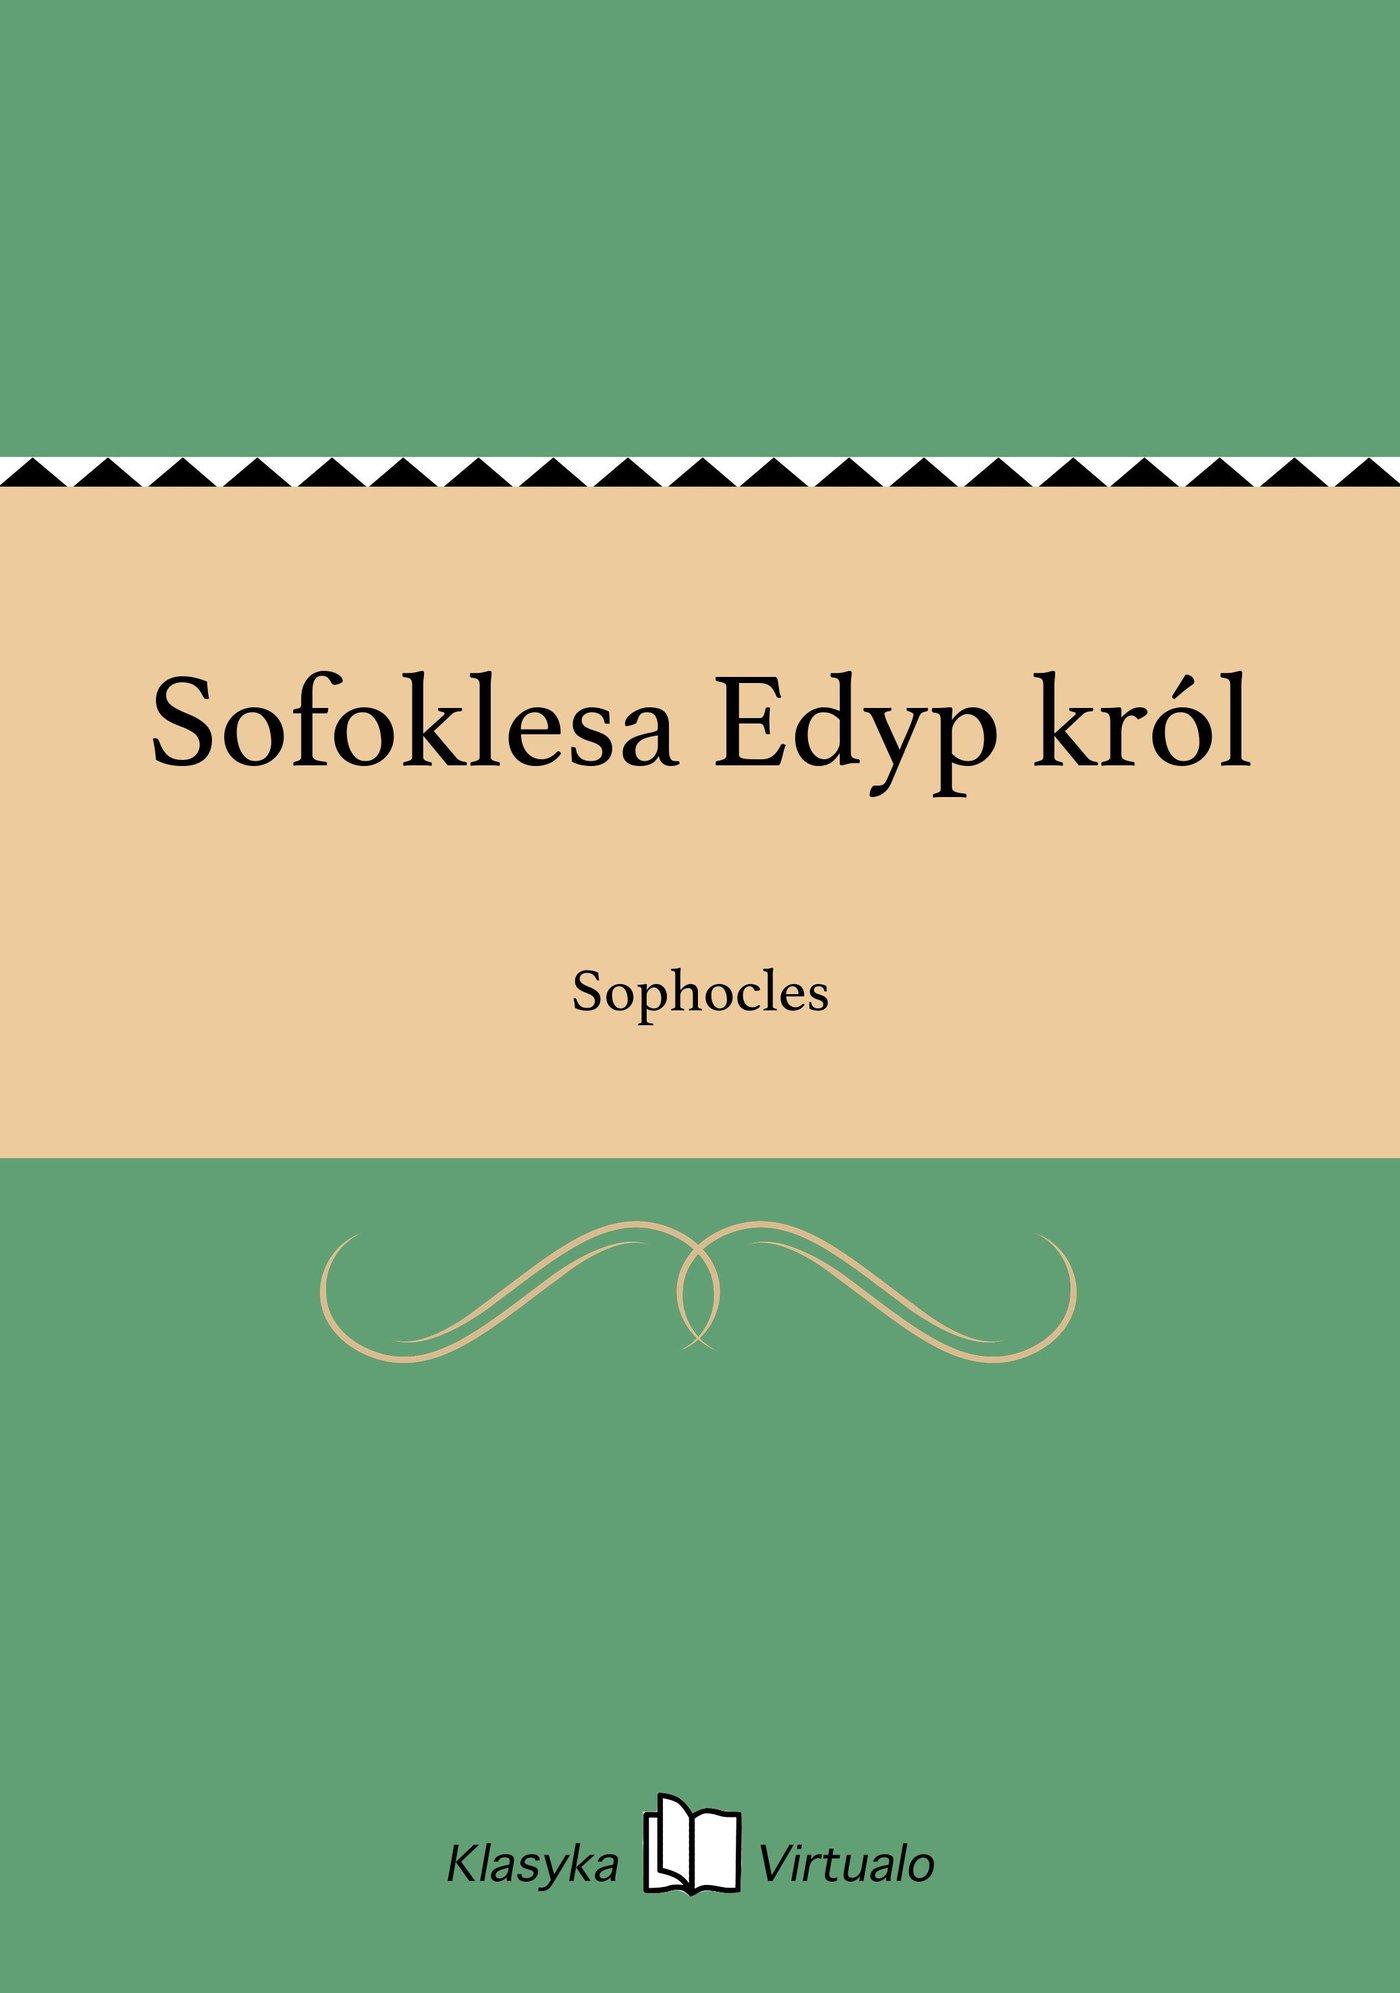 Sofoklesa Edyp król - Ebook (Książka EPUB) do pobrania w formacie EPUB